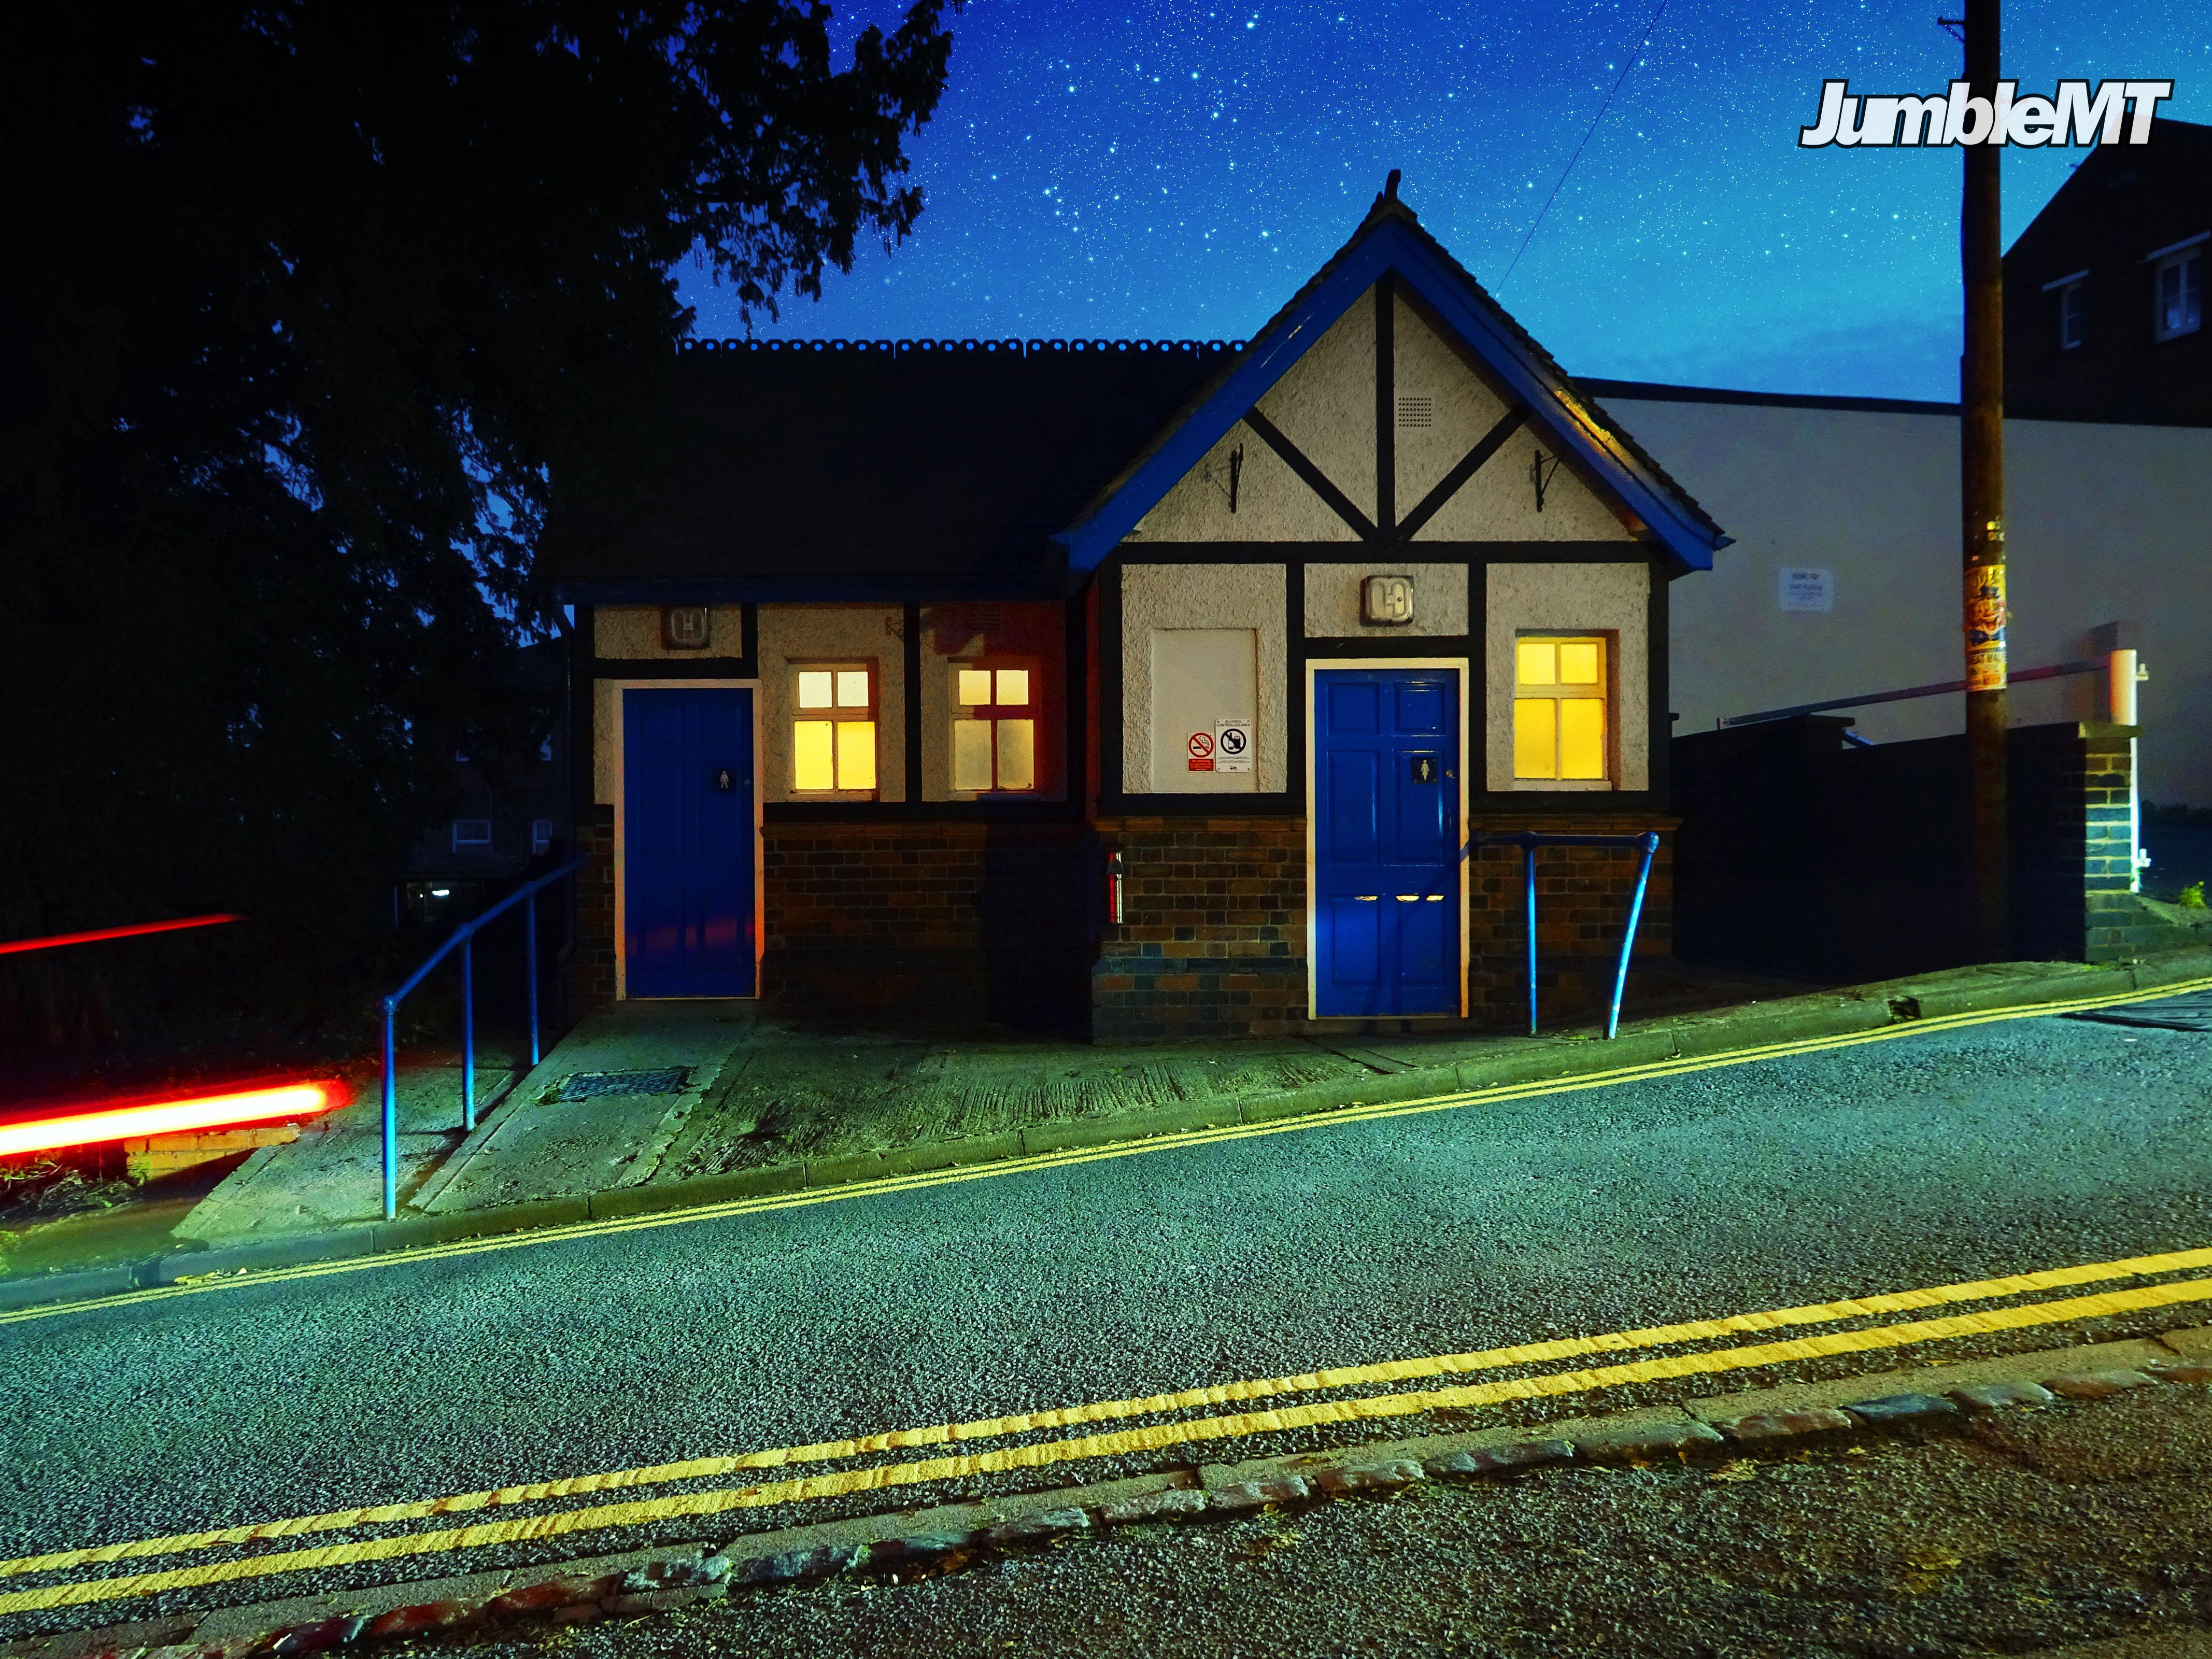 Immagini belle : fotografia notturna blu casa notte giallo